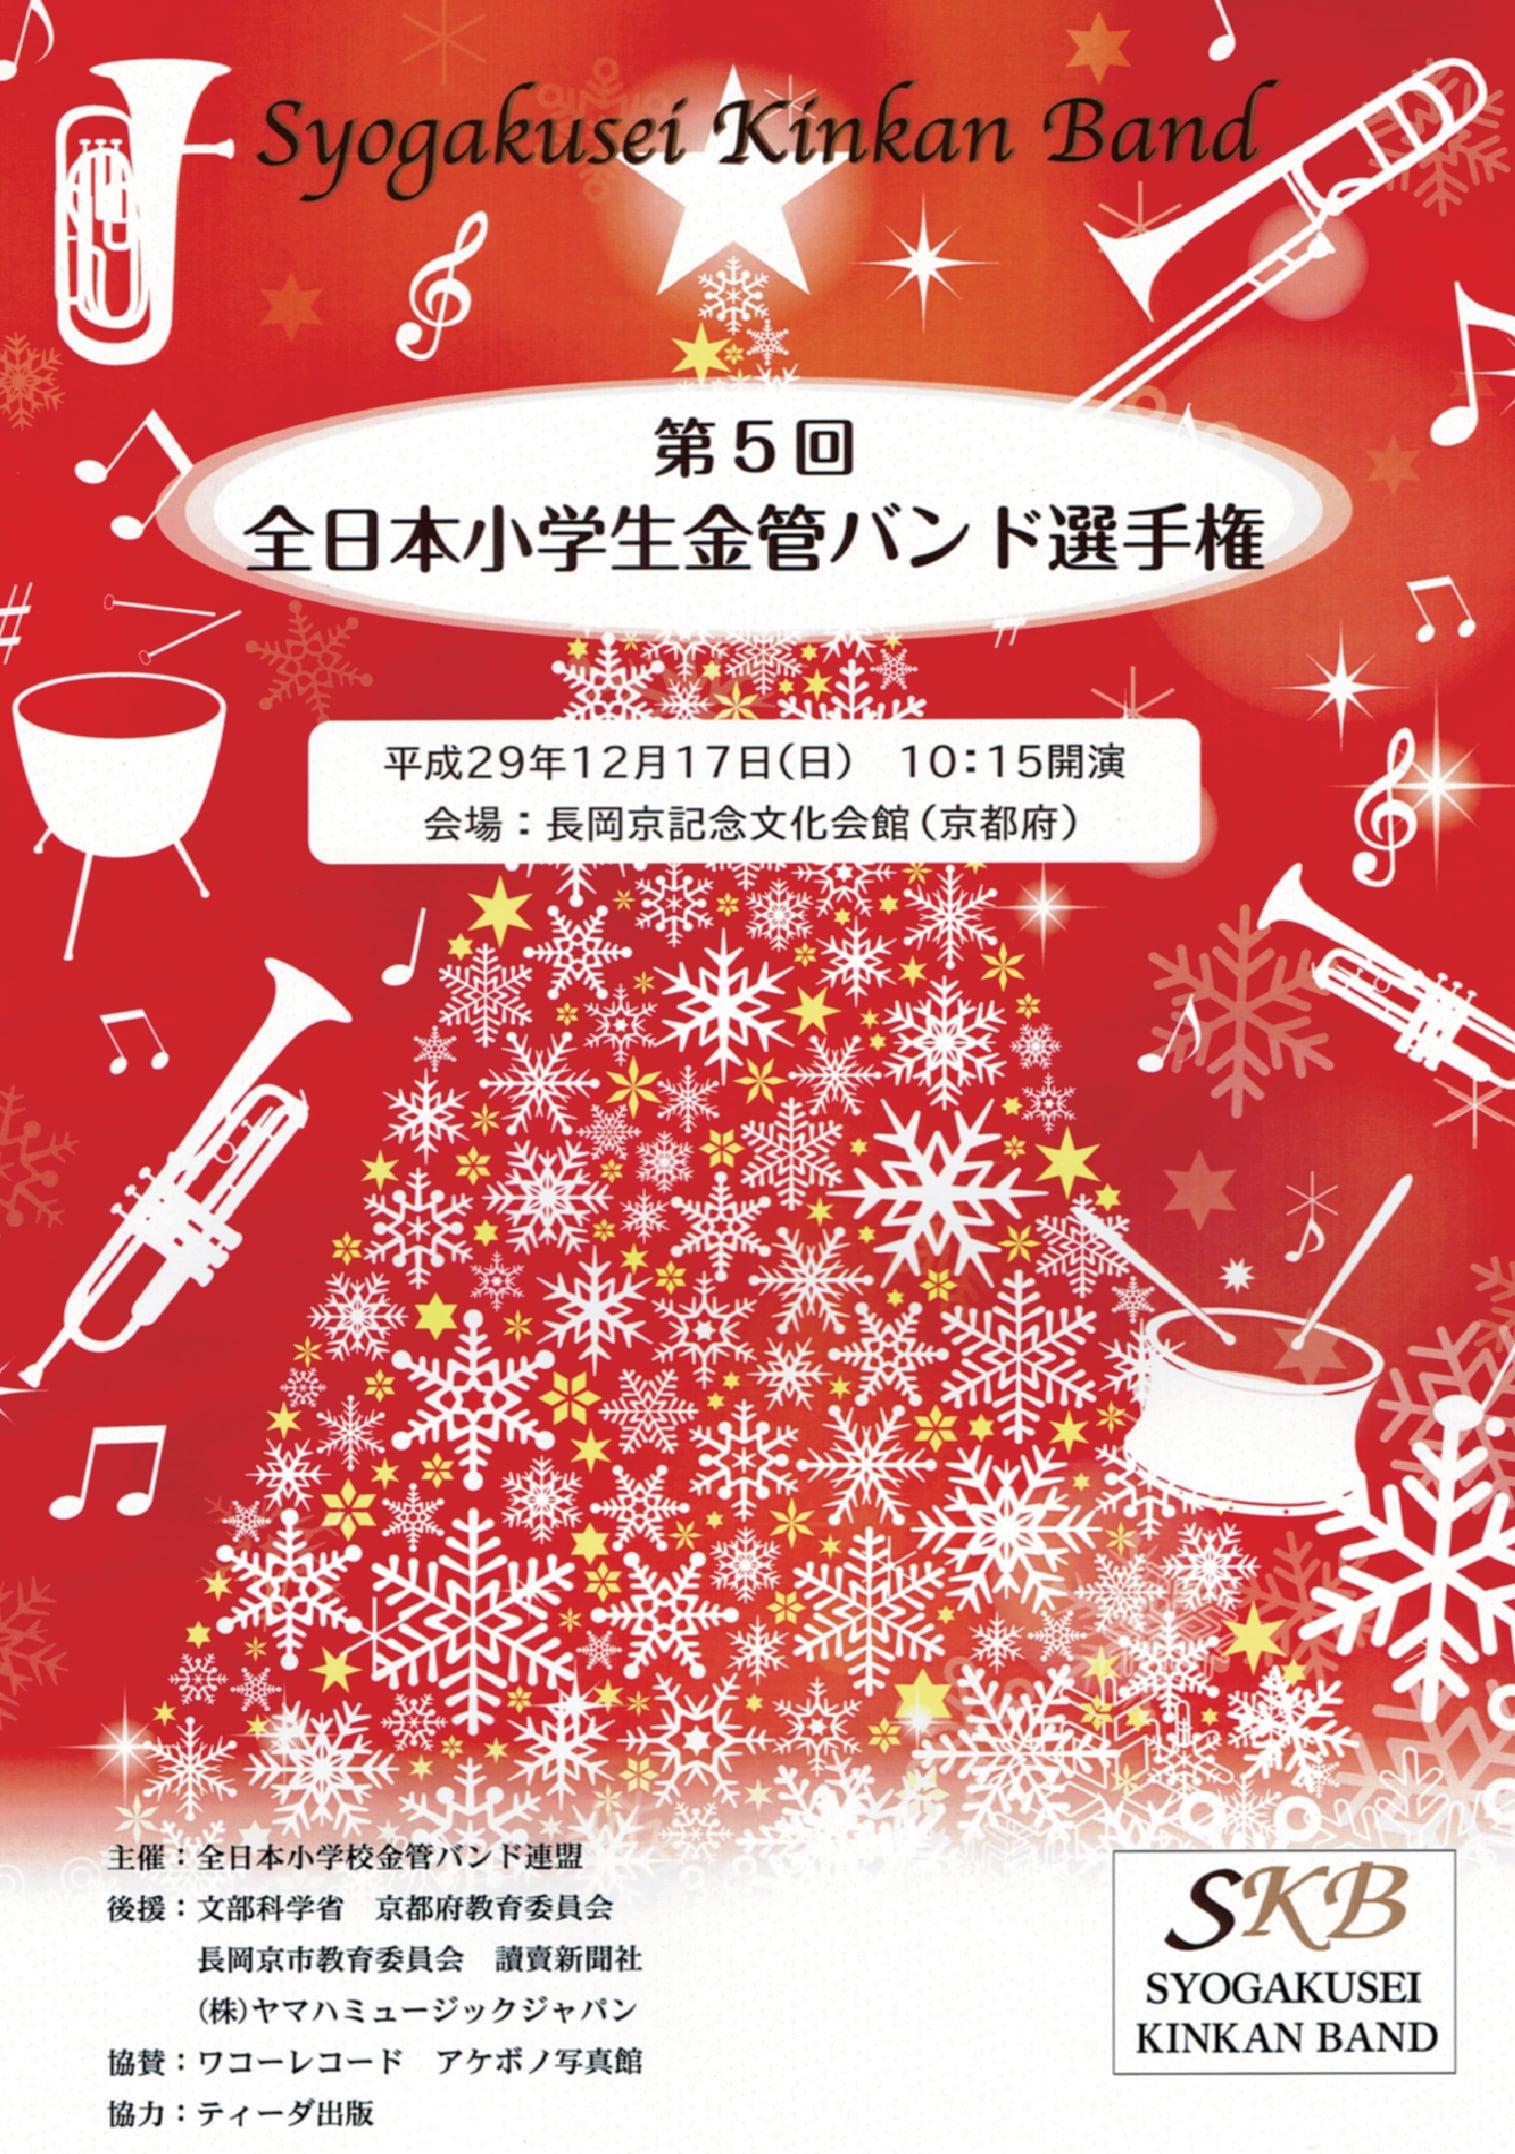 【DVD】第5回全日本小学校金管バンド選手権/グループ別収録DVD